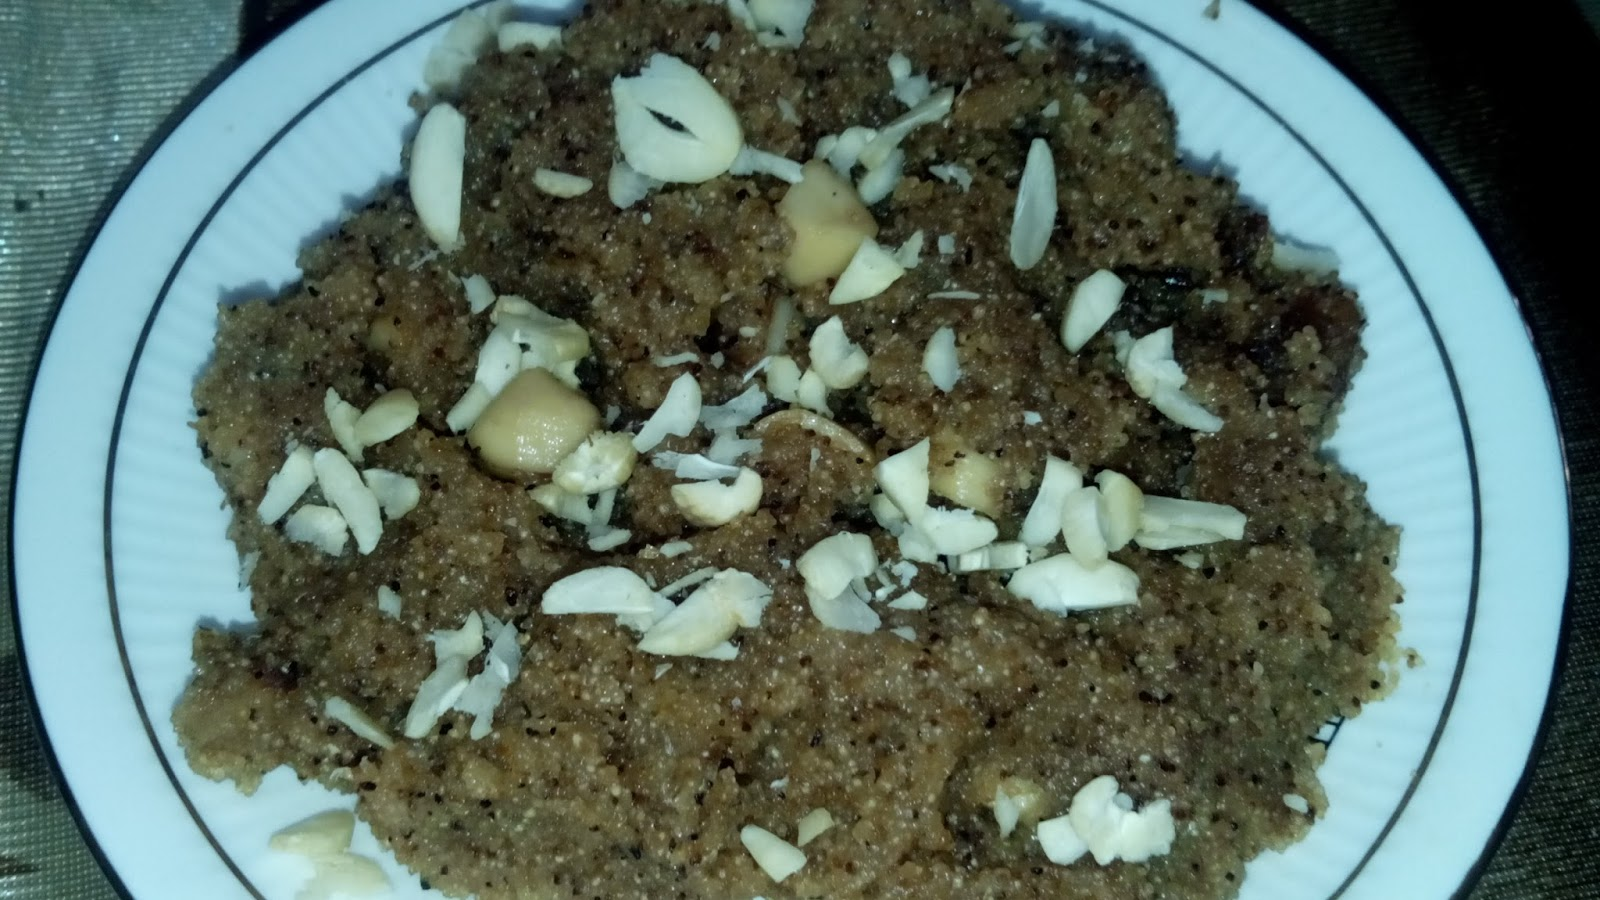 suji ka halwa recipe - semolina pudding recipe - how to make